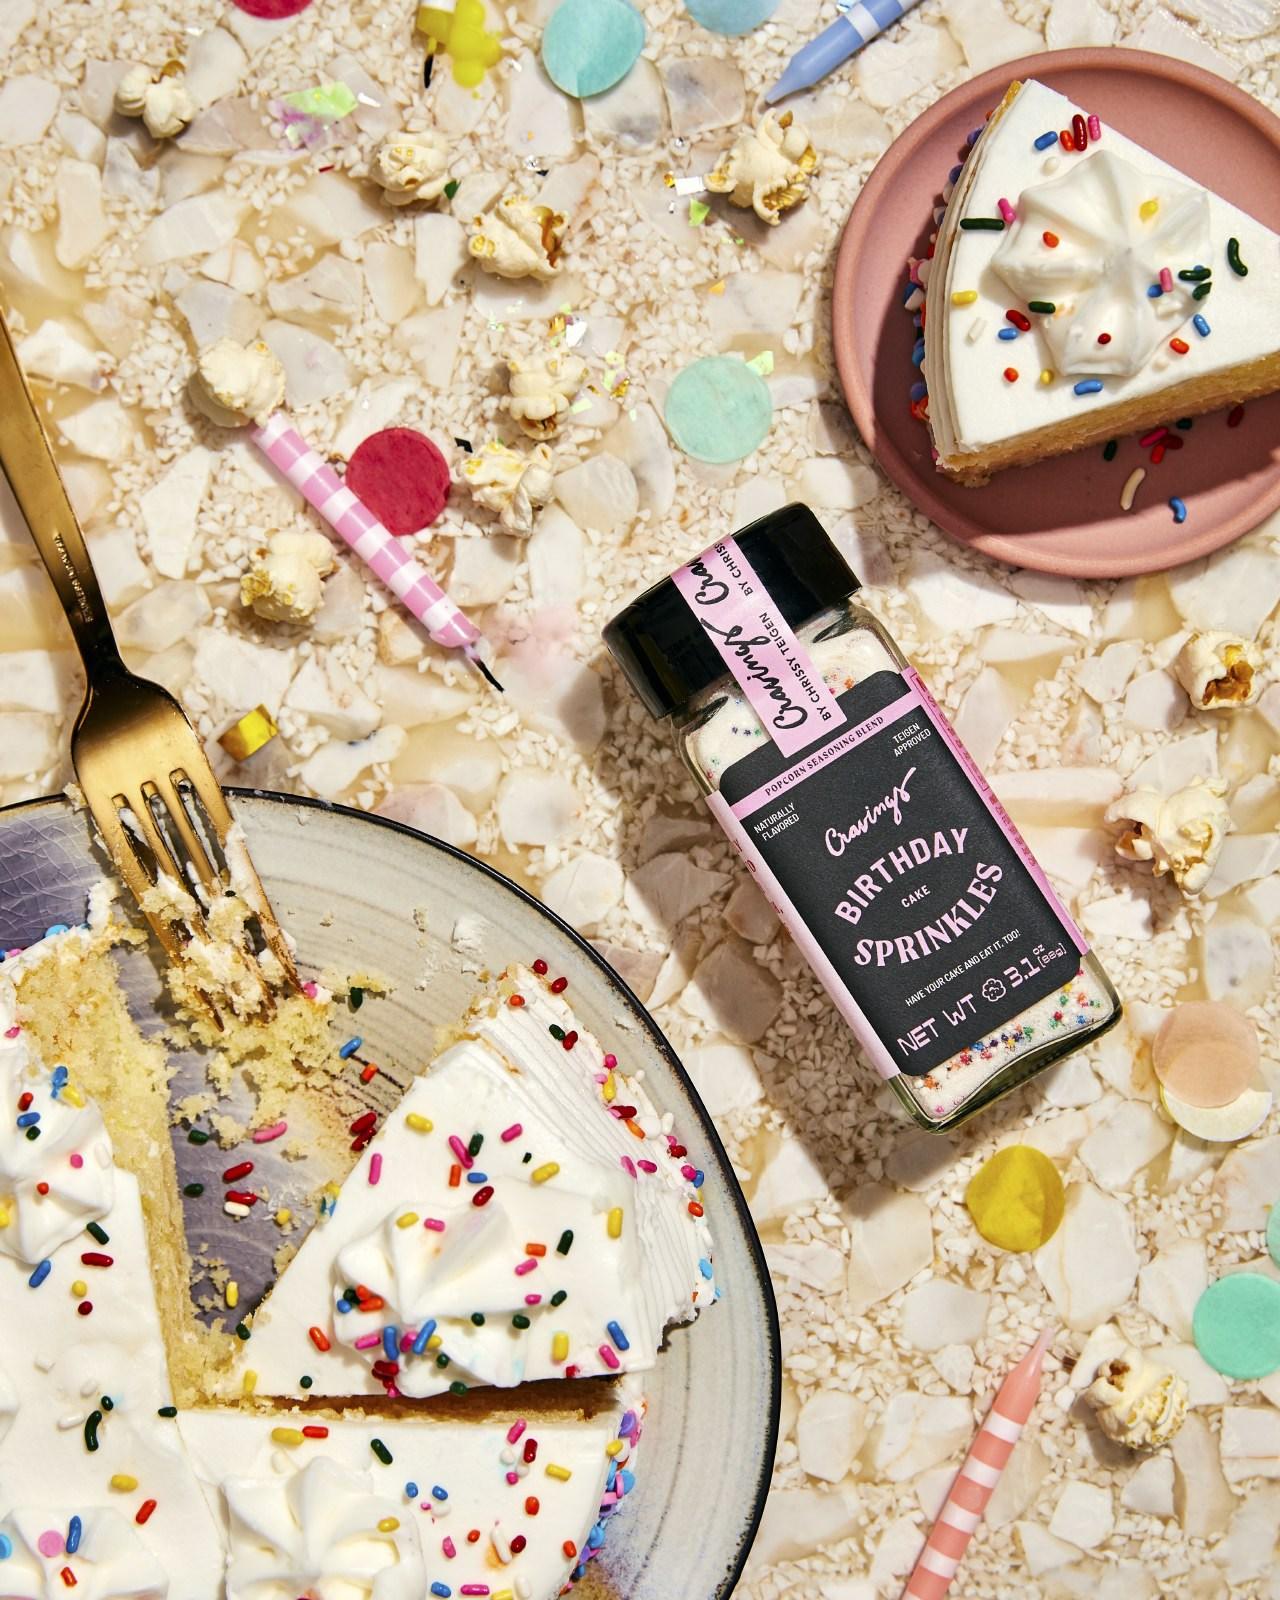 CRAVINGS POPCORN SPICE-BIRTHDAY-CAKE